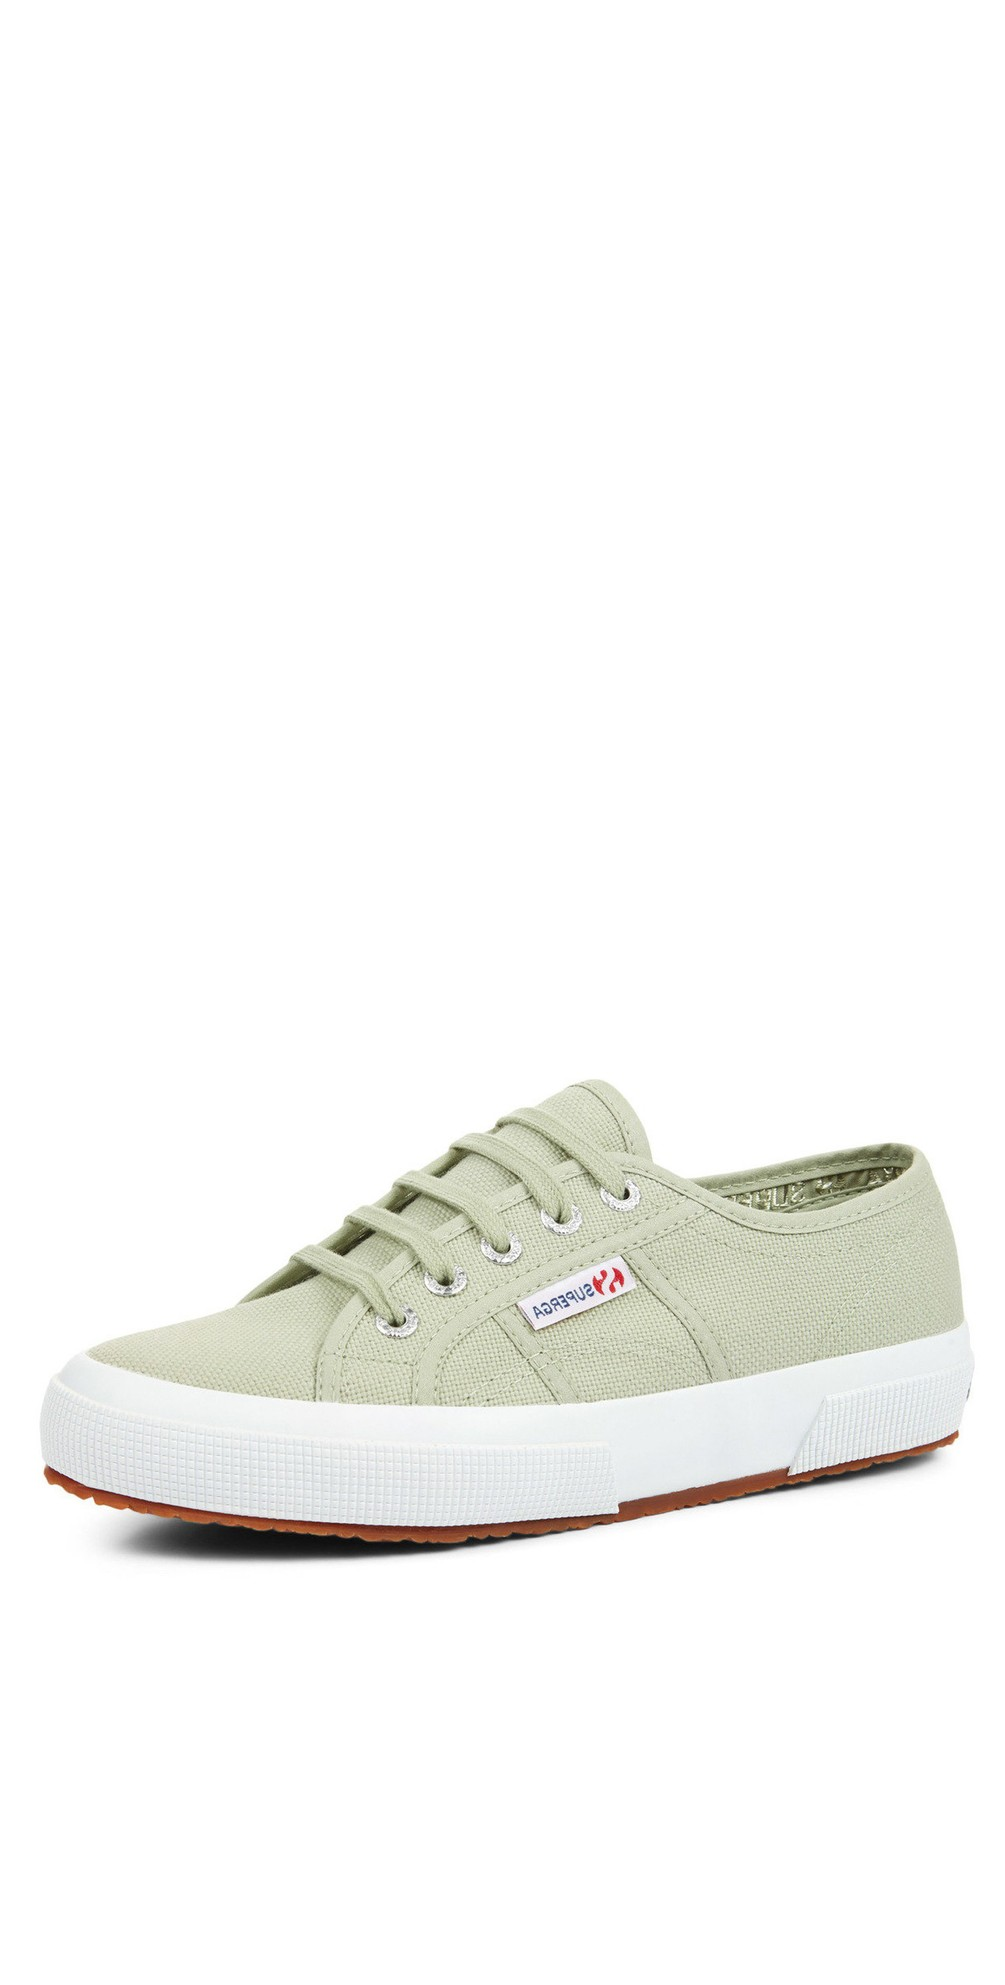 Classic Green Sage 2750 Cotu Shoe main image